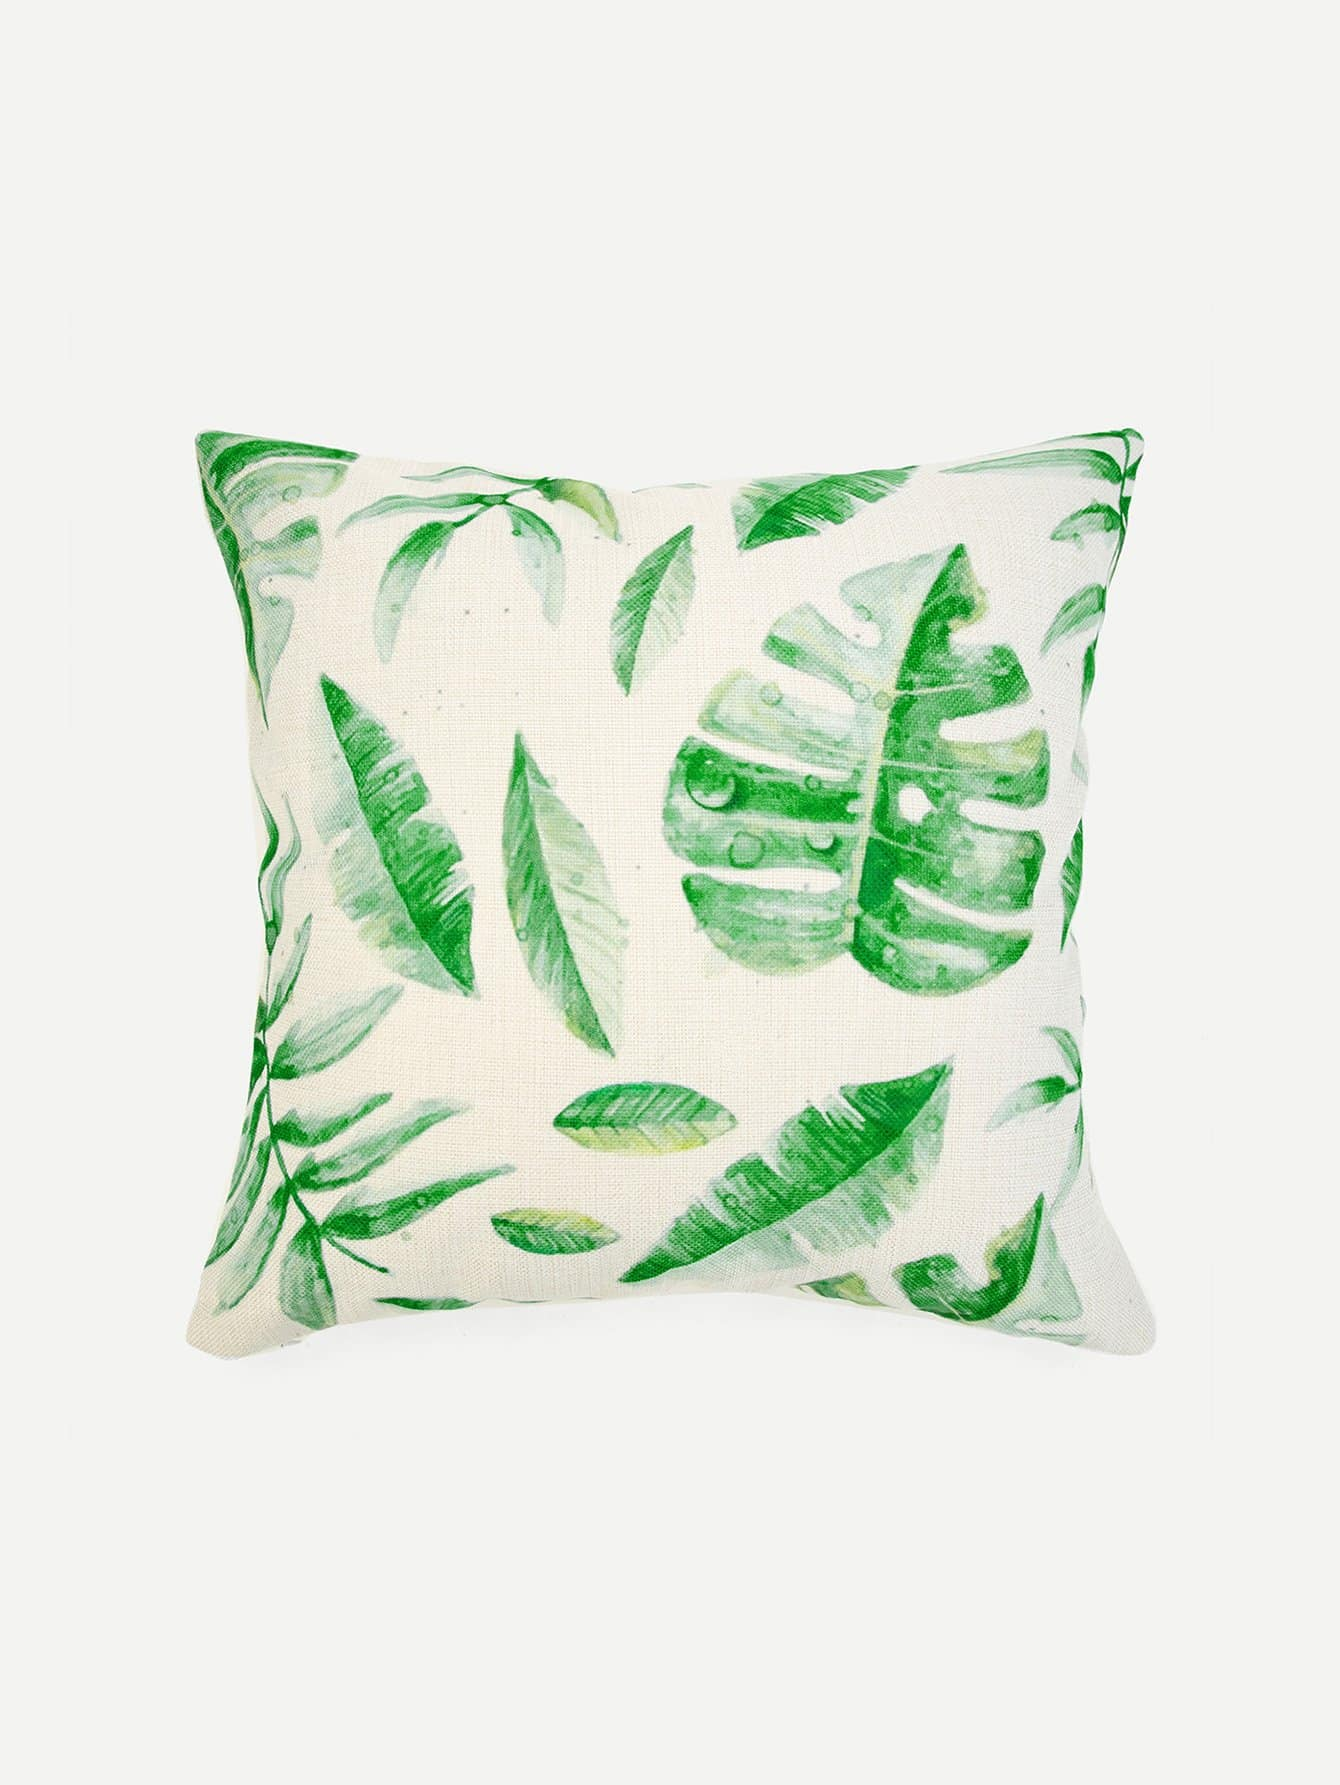 Leaf Pillow Case Cover 1PC leaf pillow case cover 1pc